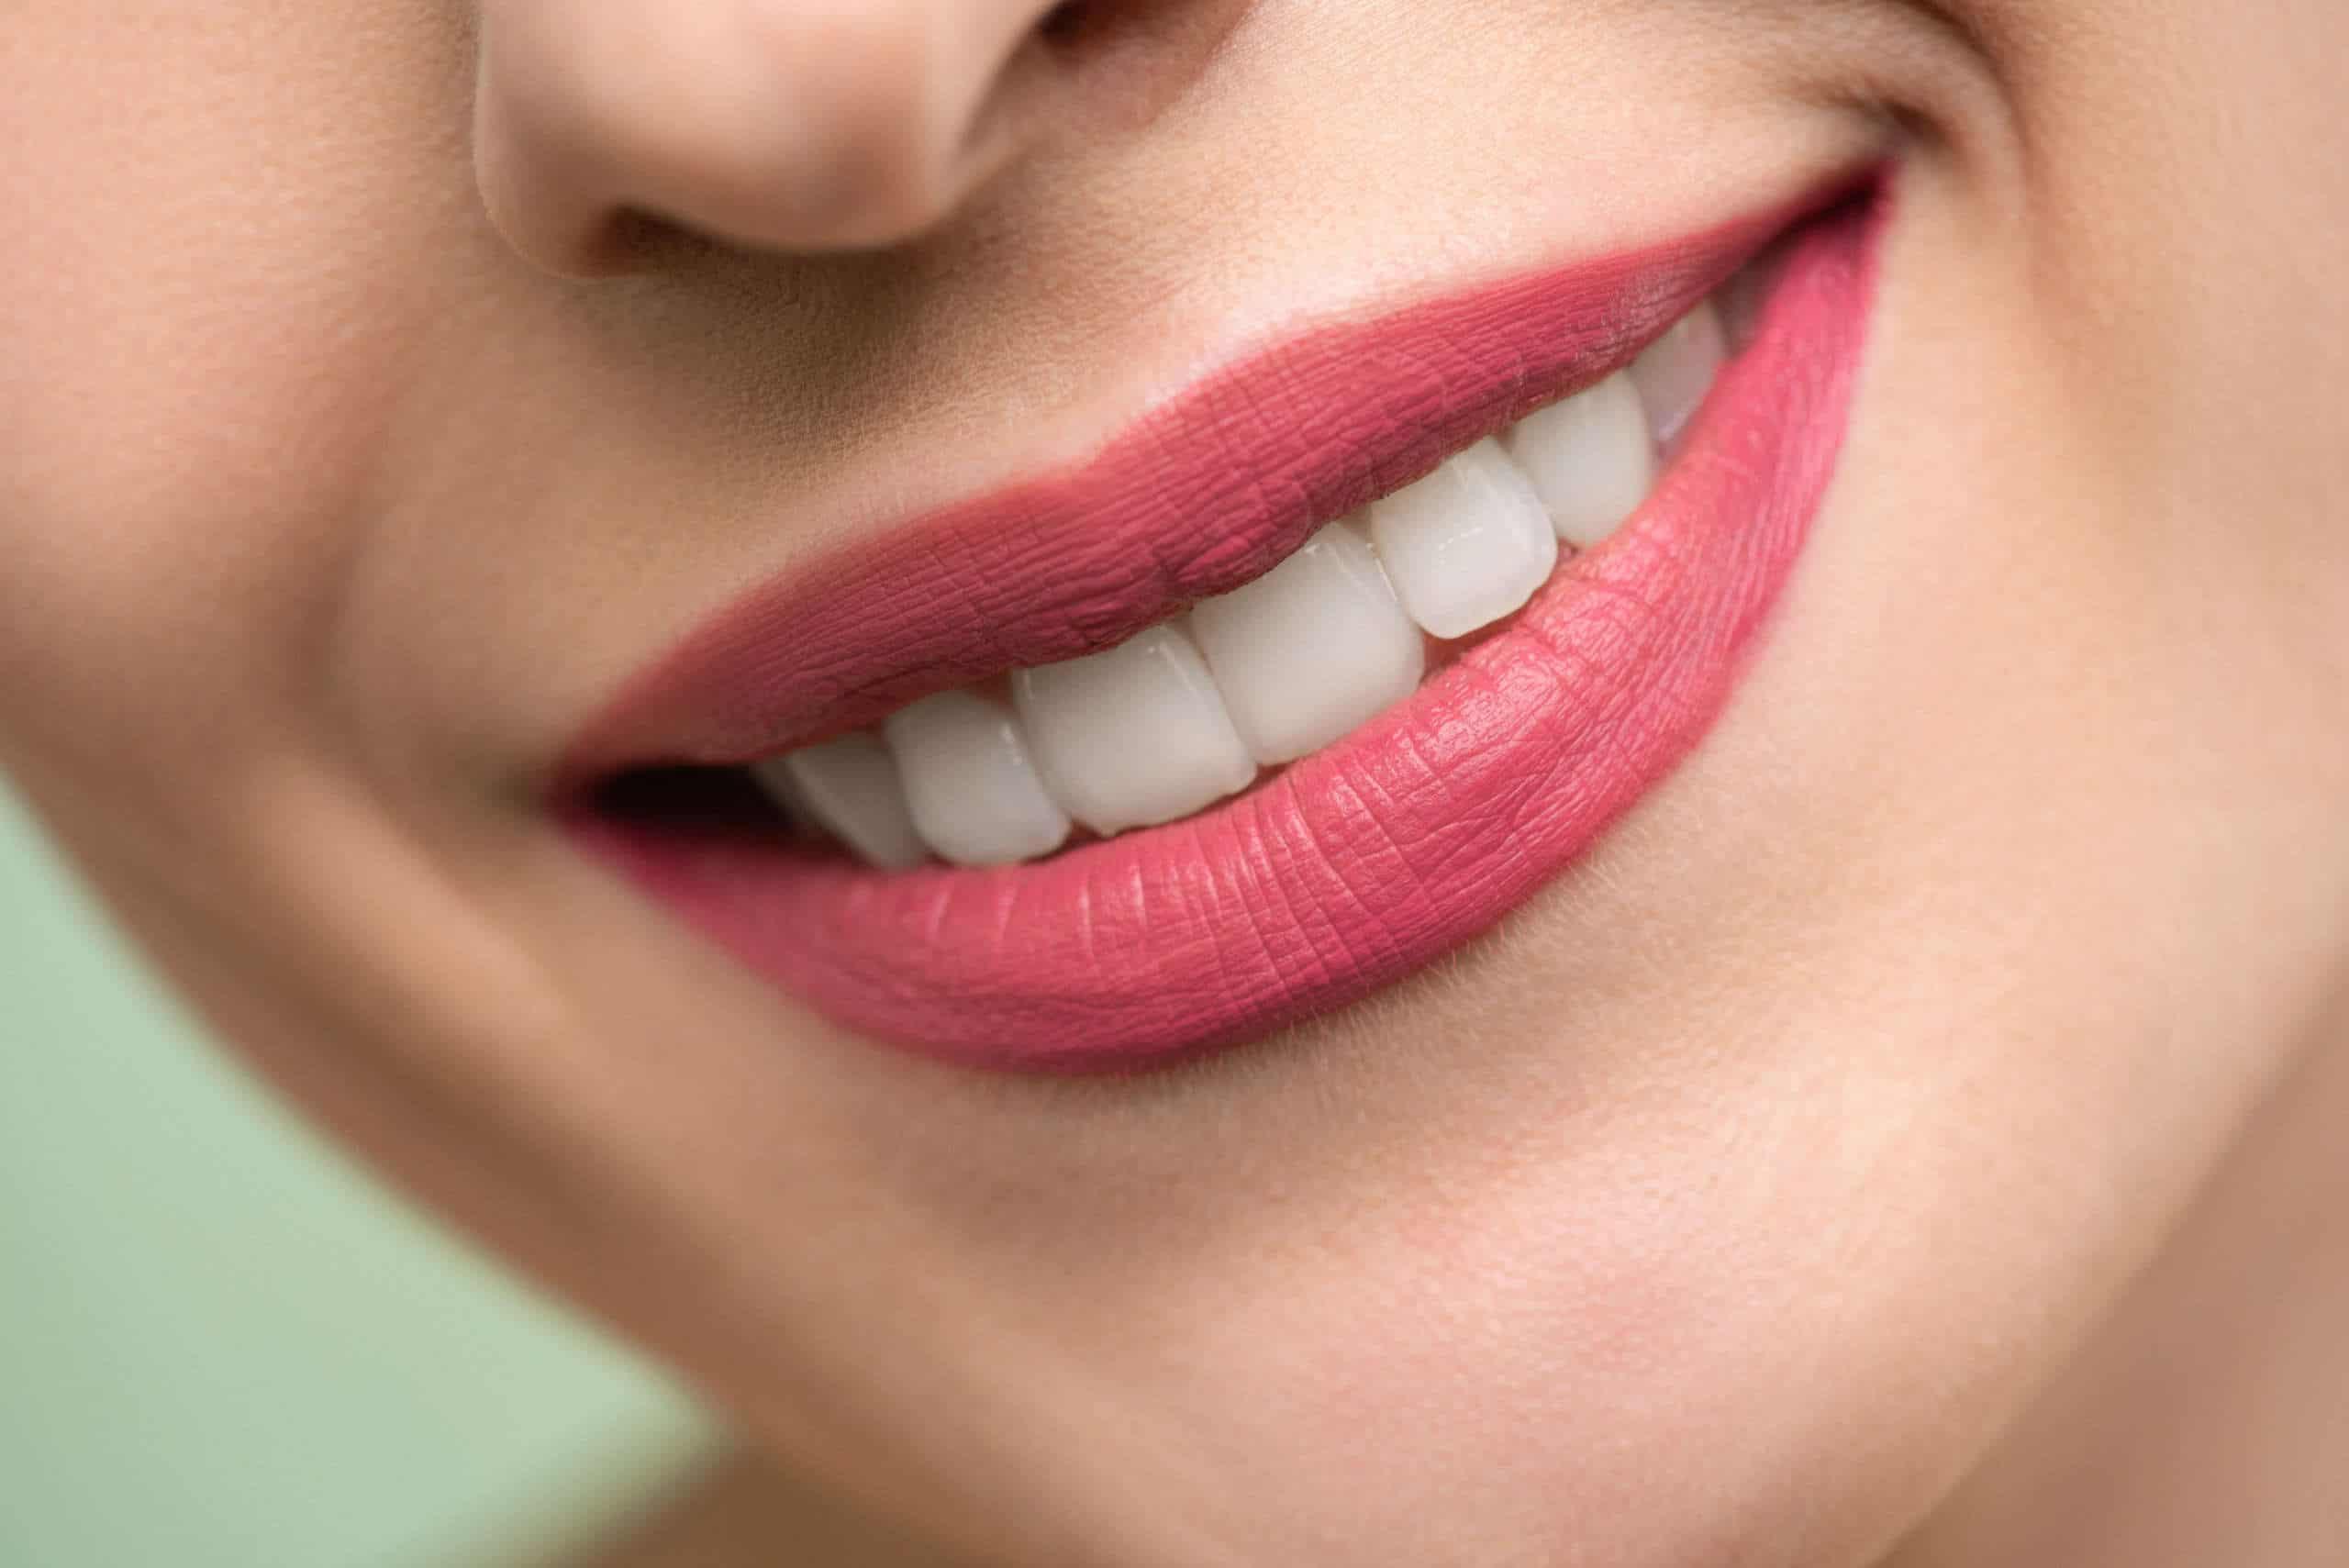 Responsabilità civile medica: l'odontoiatra